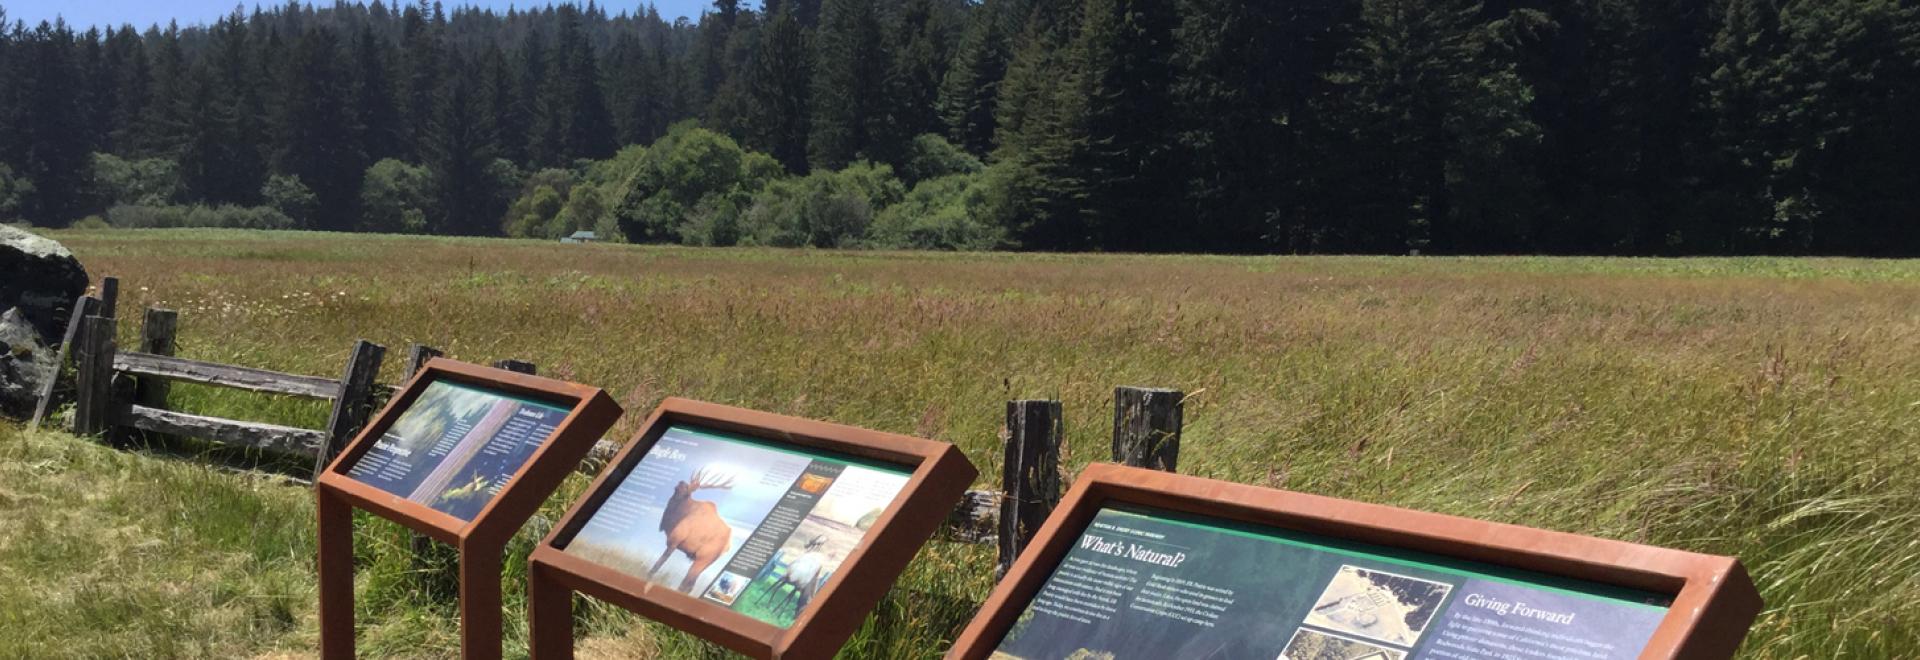 Wayside signs at Prairie Creek Redwoods State Park